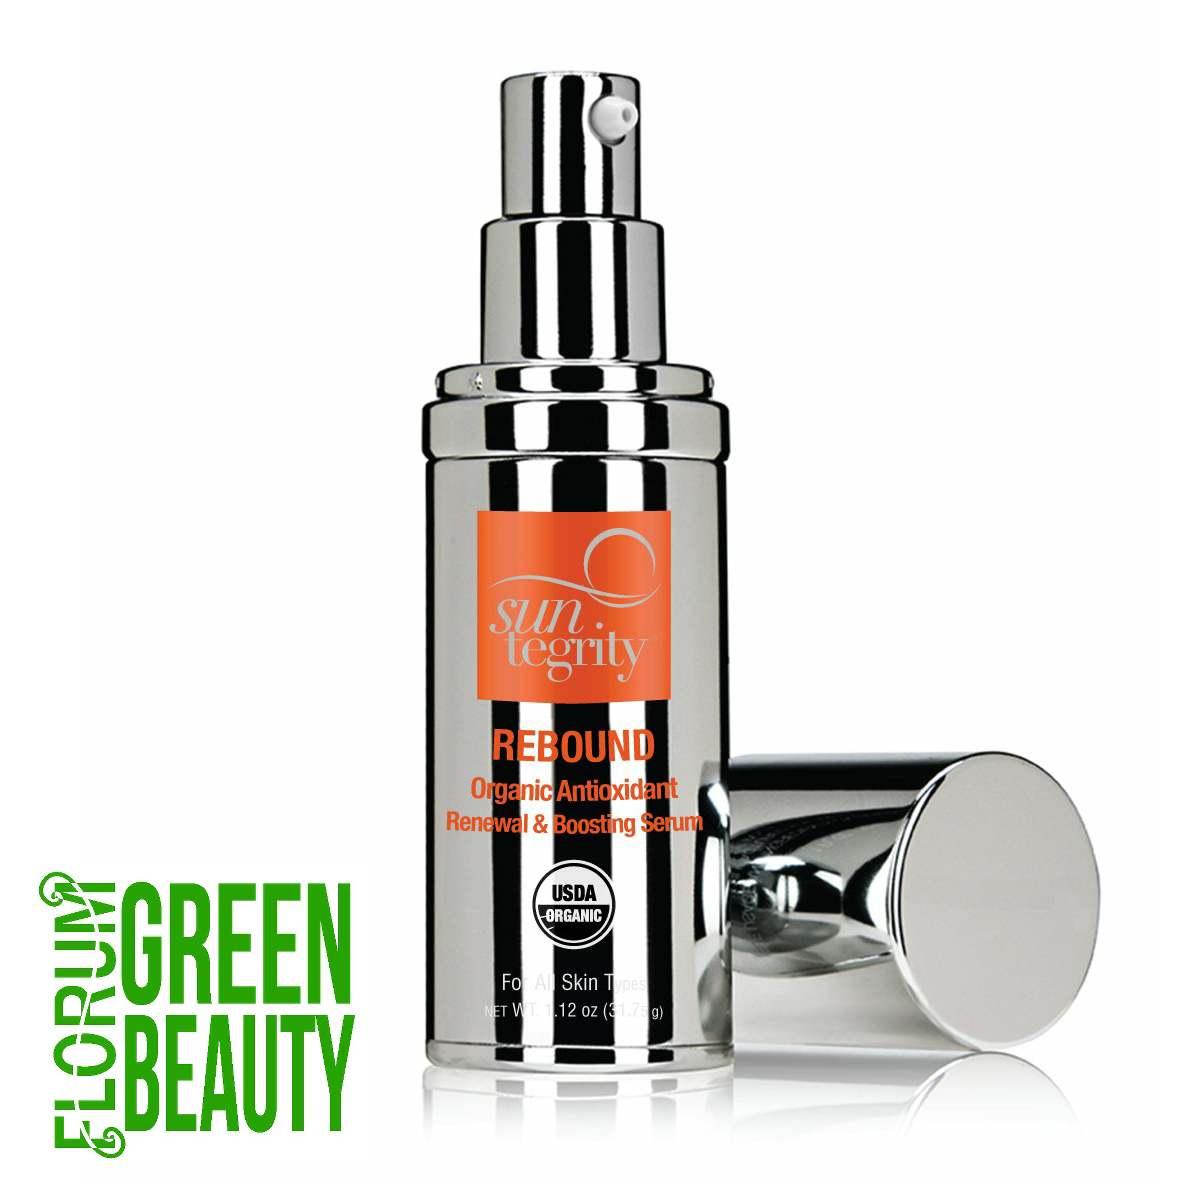 Suntegrity - Rebound Organic Antioxidant Renewal Serum